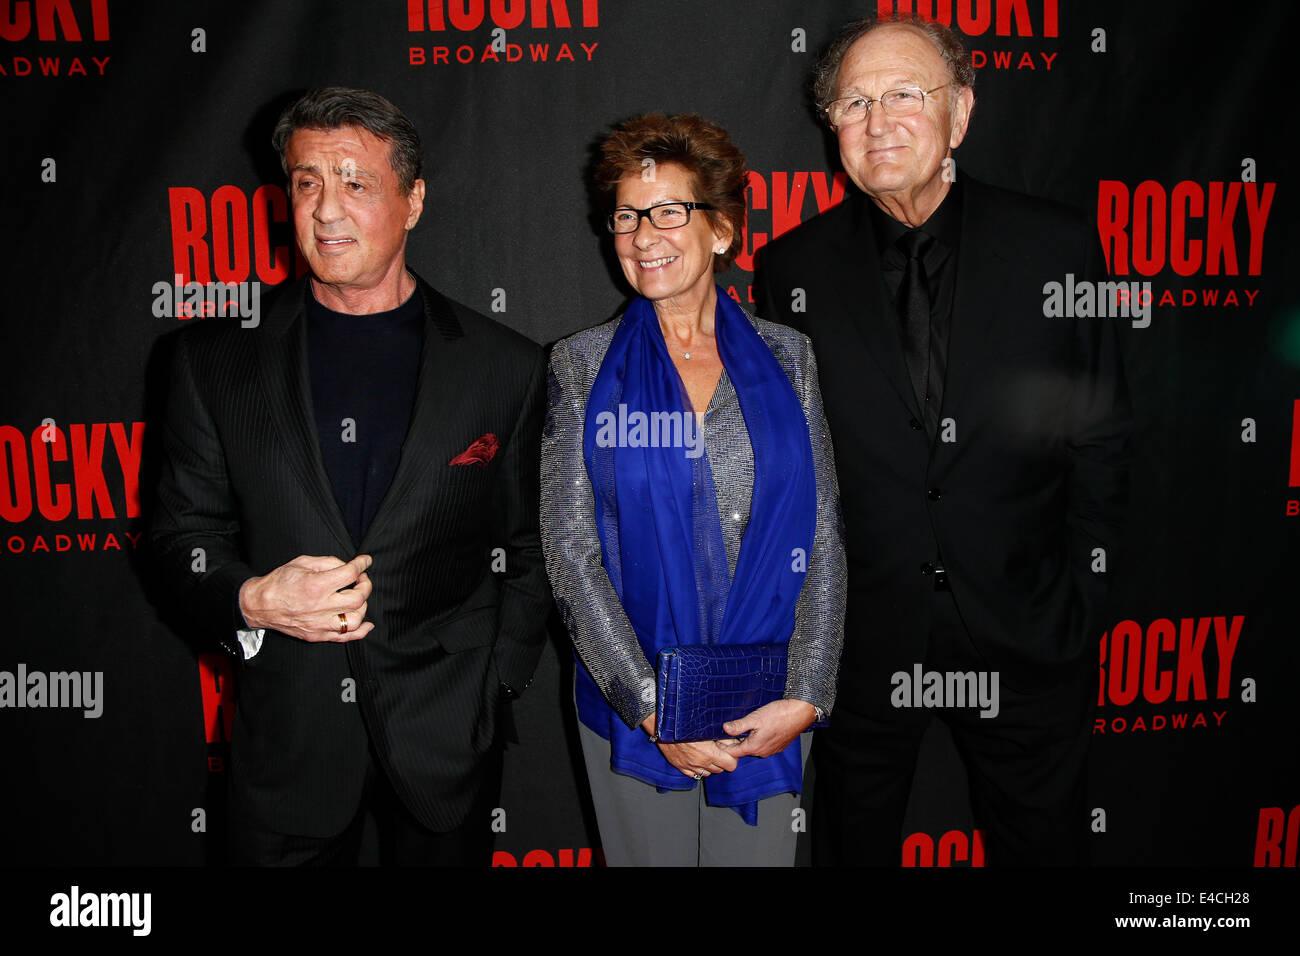 (L-R) Actor Sylvester Stallone, Janine Van Den Ende and producer Joop Van Den Ende attend the 'Rocky' Broadway - Stock Image